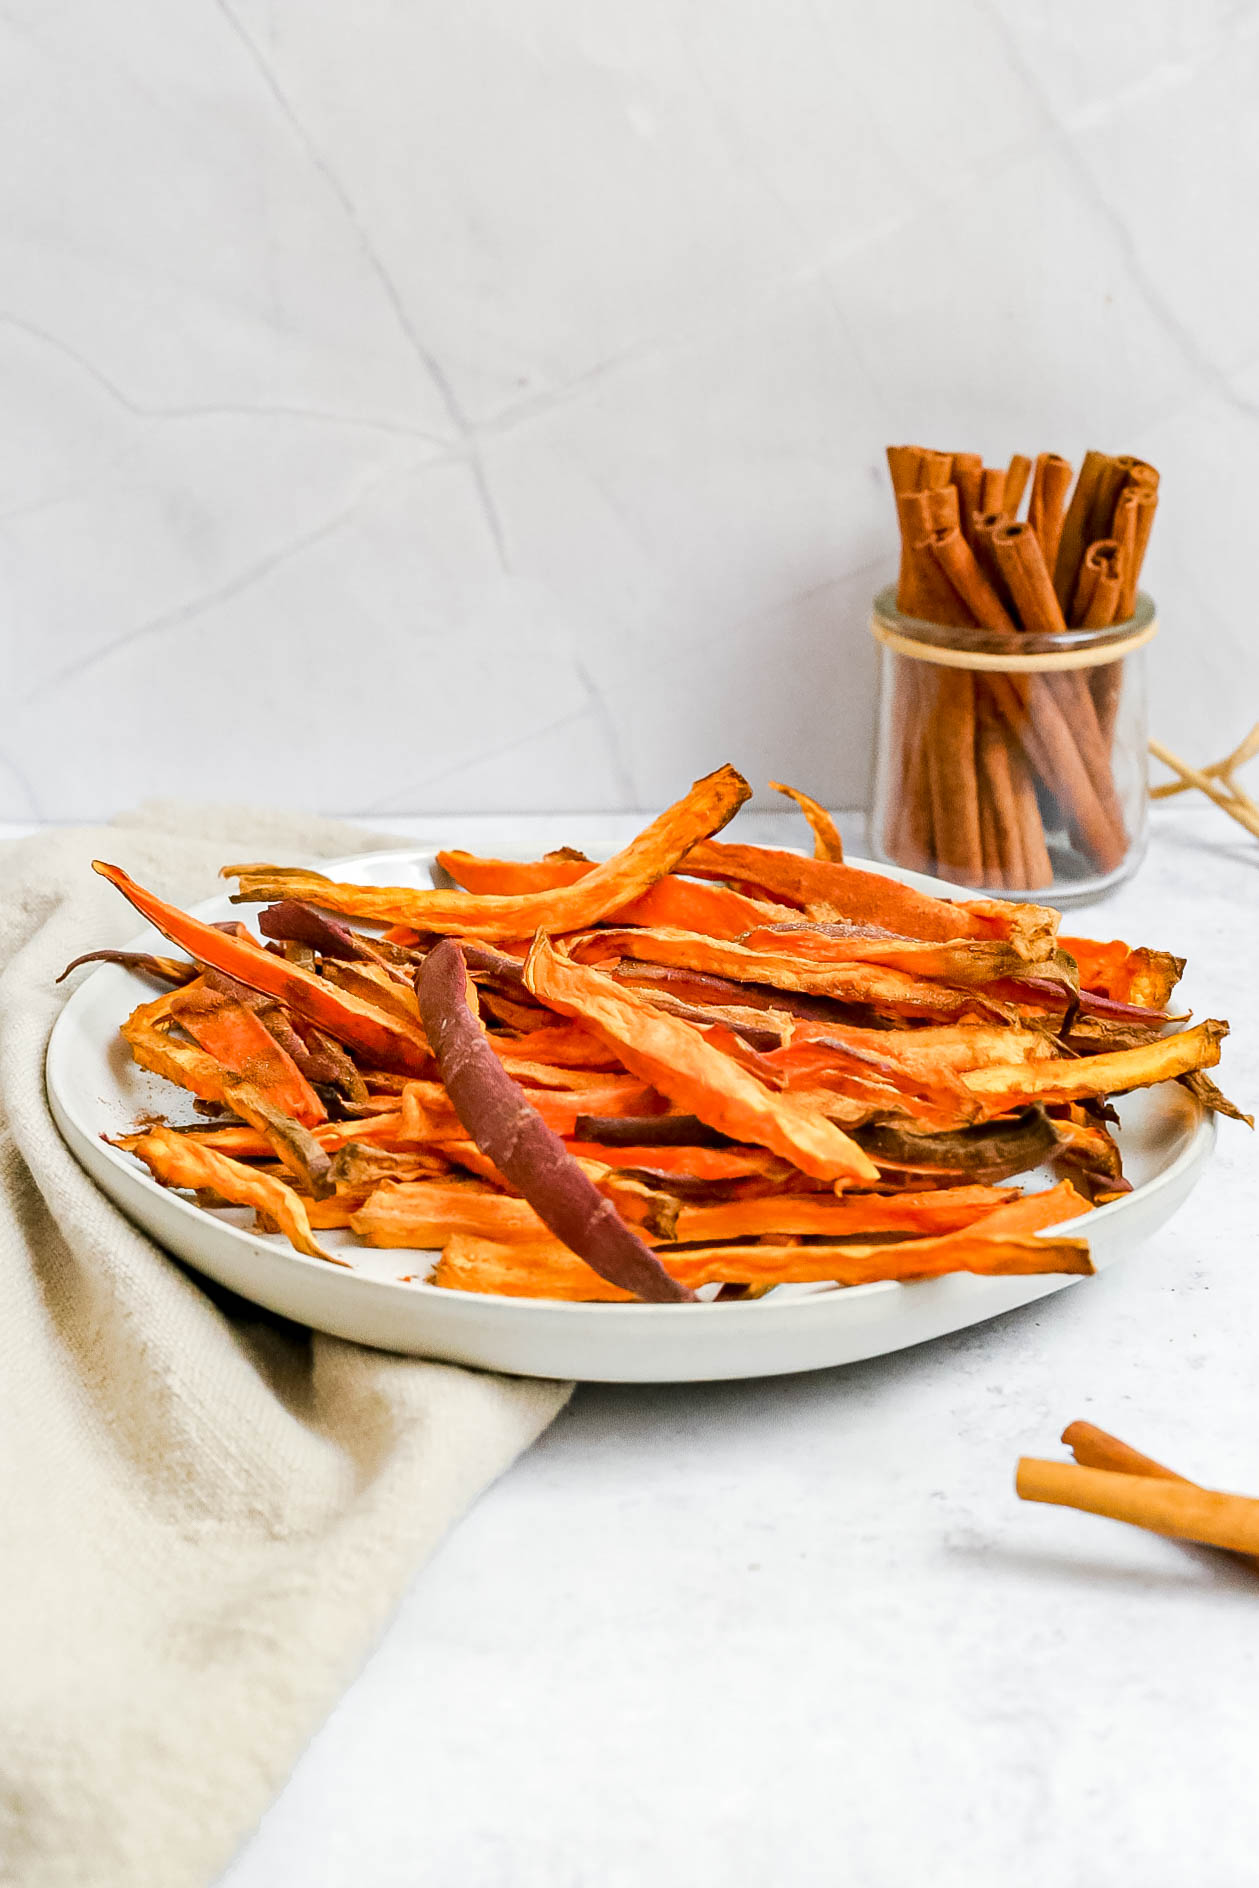 Sweet spiced sweet potato fries